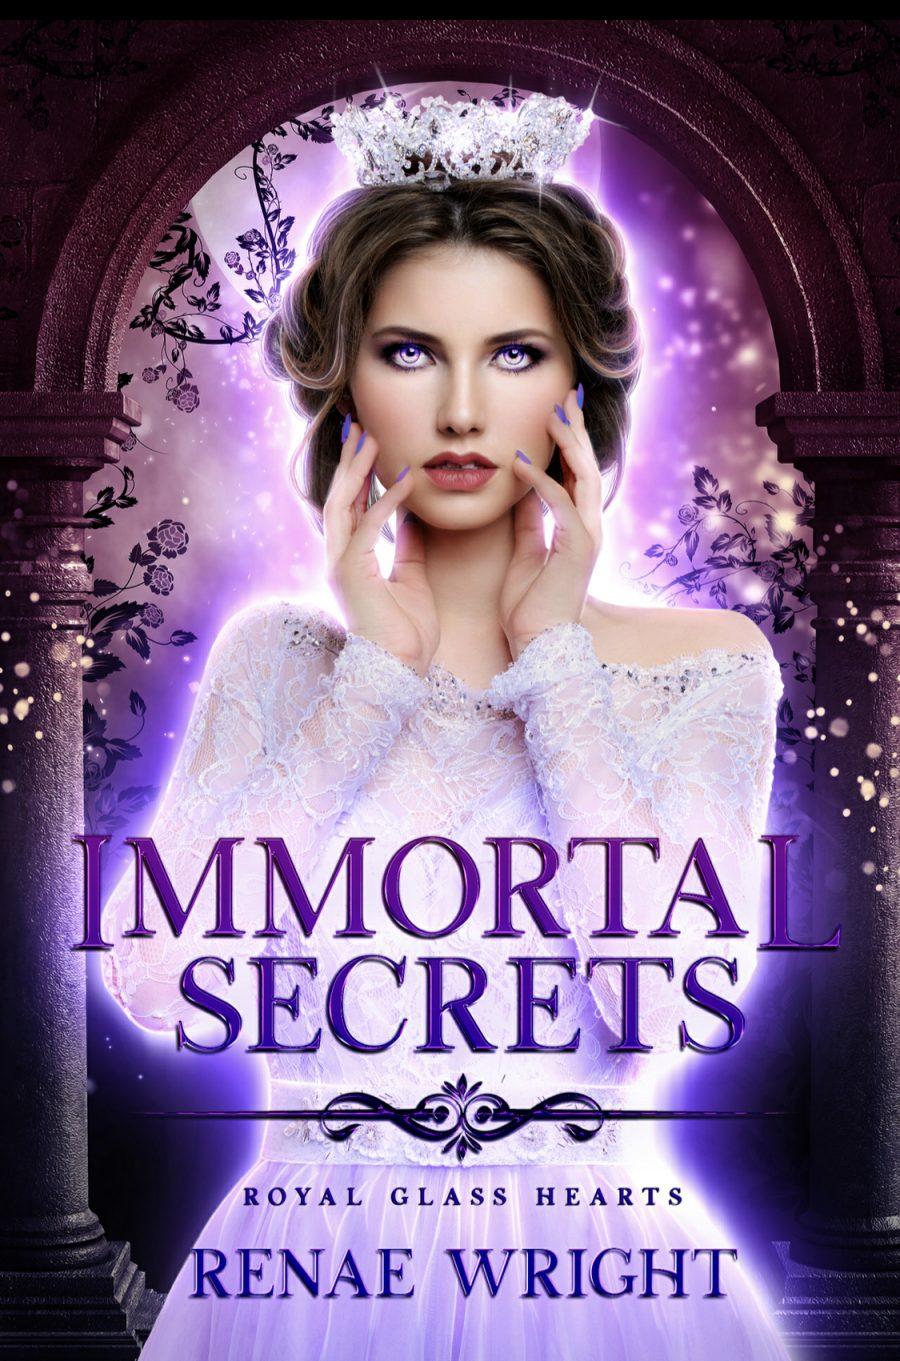 Immortal Secrets by Renae Wright - A Book Review #BookReview #4Stars #SlowBurn #RH #Fairytale #FriendGoals #KindleUnlimited #KU